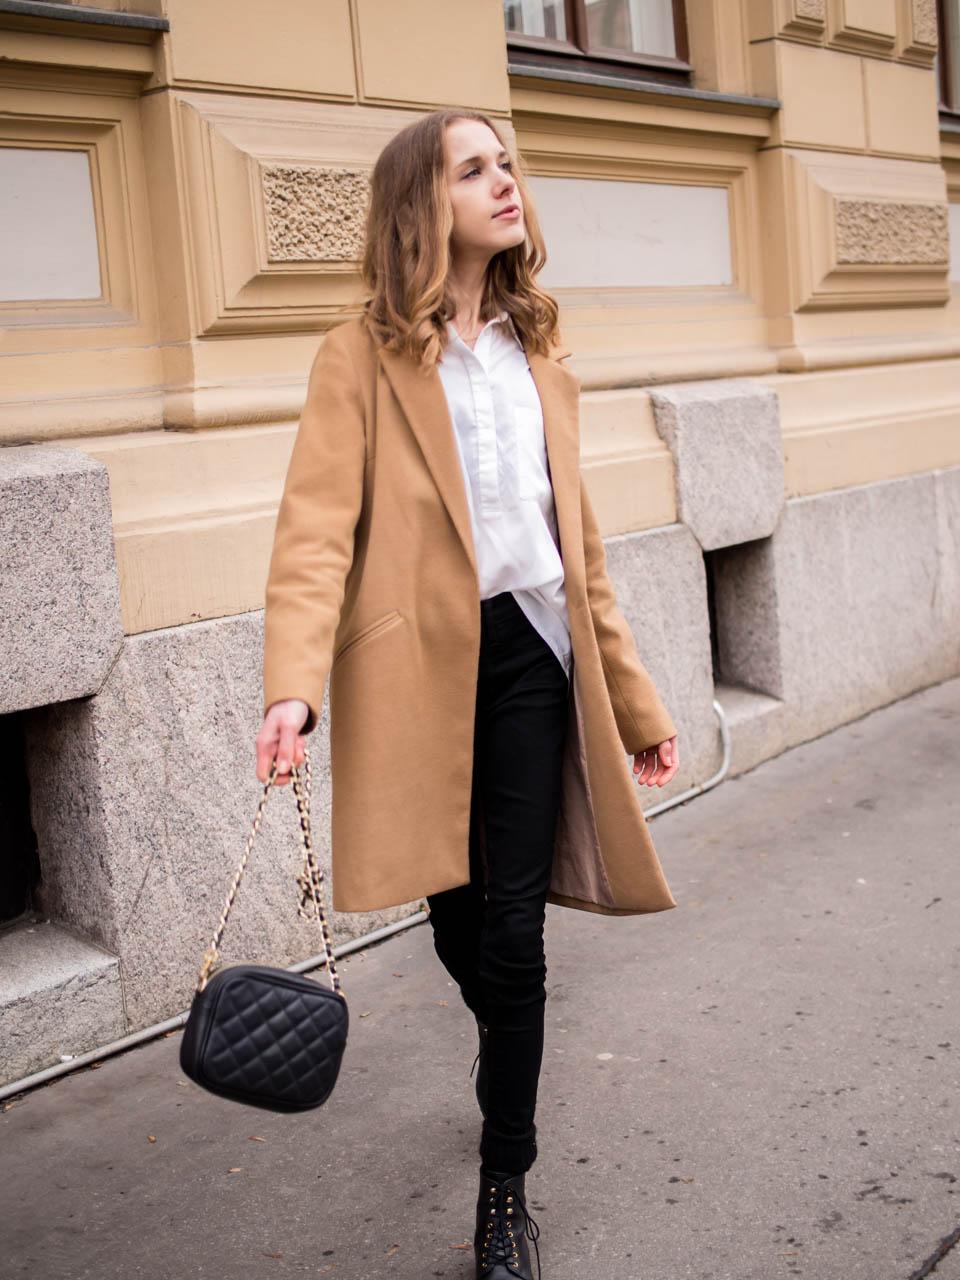 Klassinen tyyli // Classy and timeless style